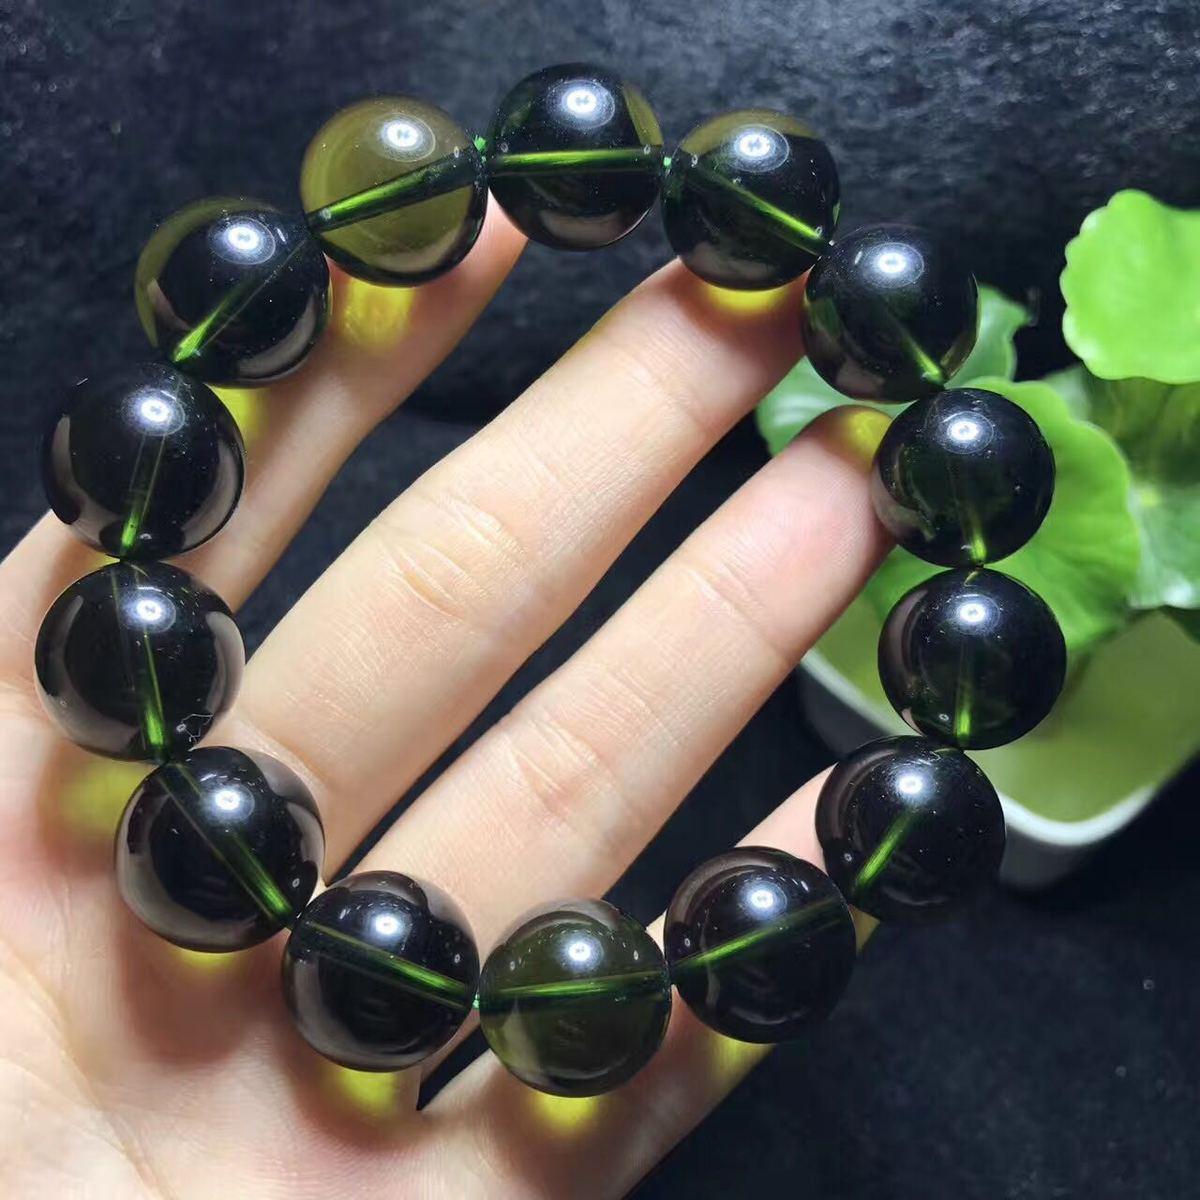 Quality Goods Crystal Czekh Meteorite Ball Bracelet Hand String Atmosphere Green Single Circle Ornaments Gift Green Meteorite цена 2017